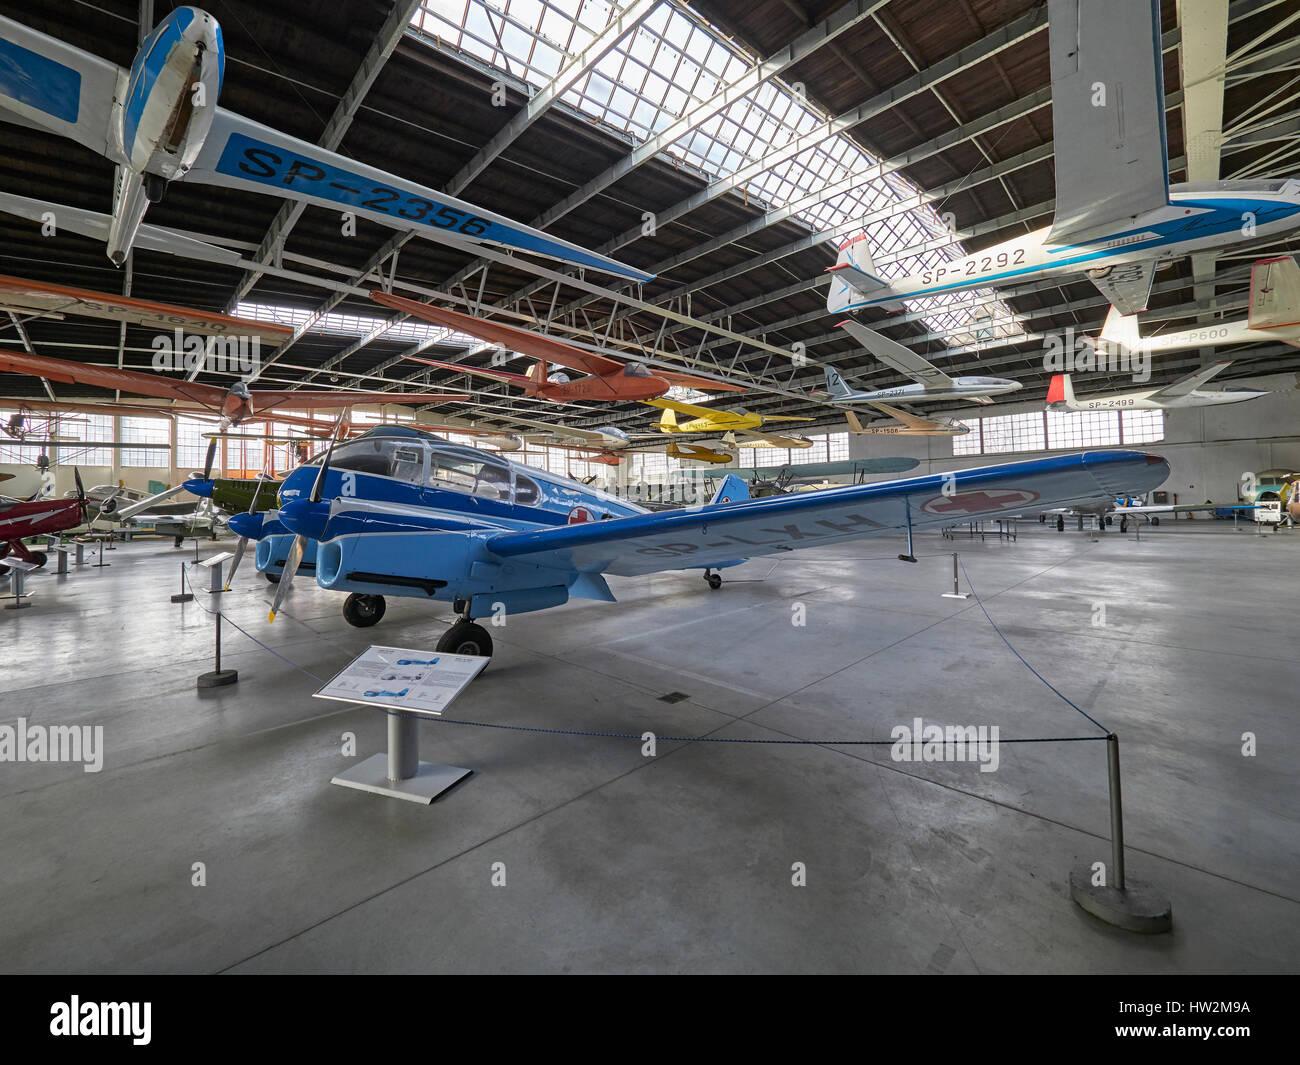 Aero Ae-45 at the Polish Aviation Museum Krakow in Poland - Stock Image